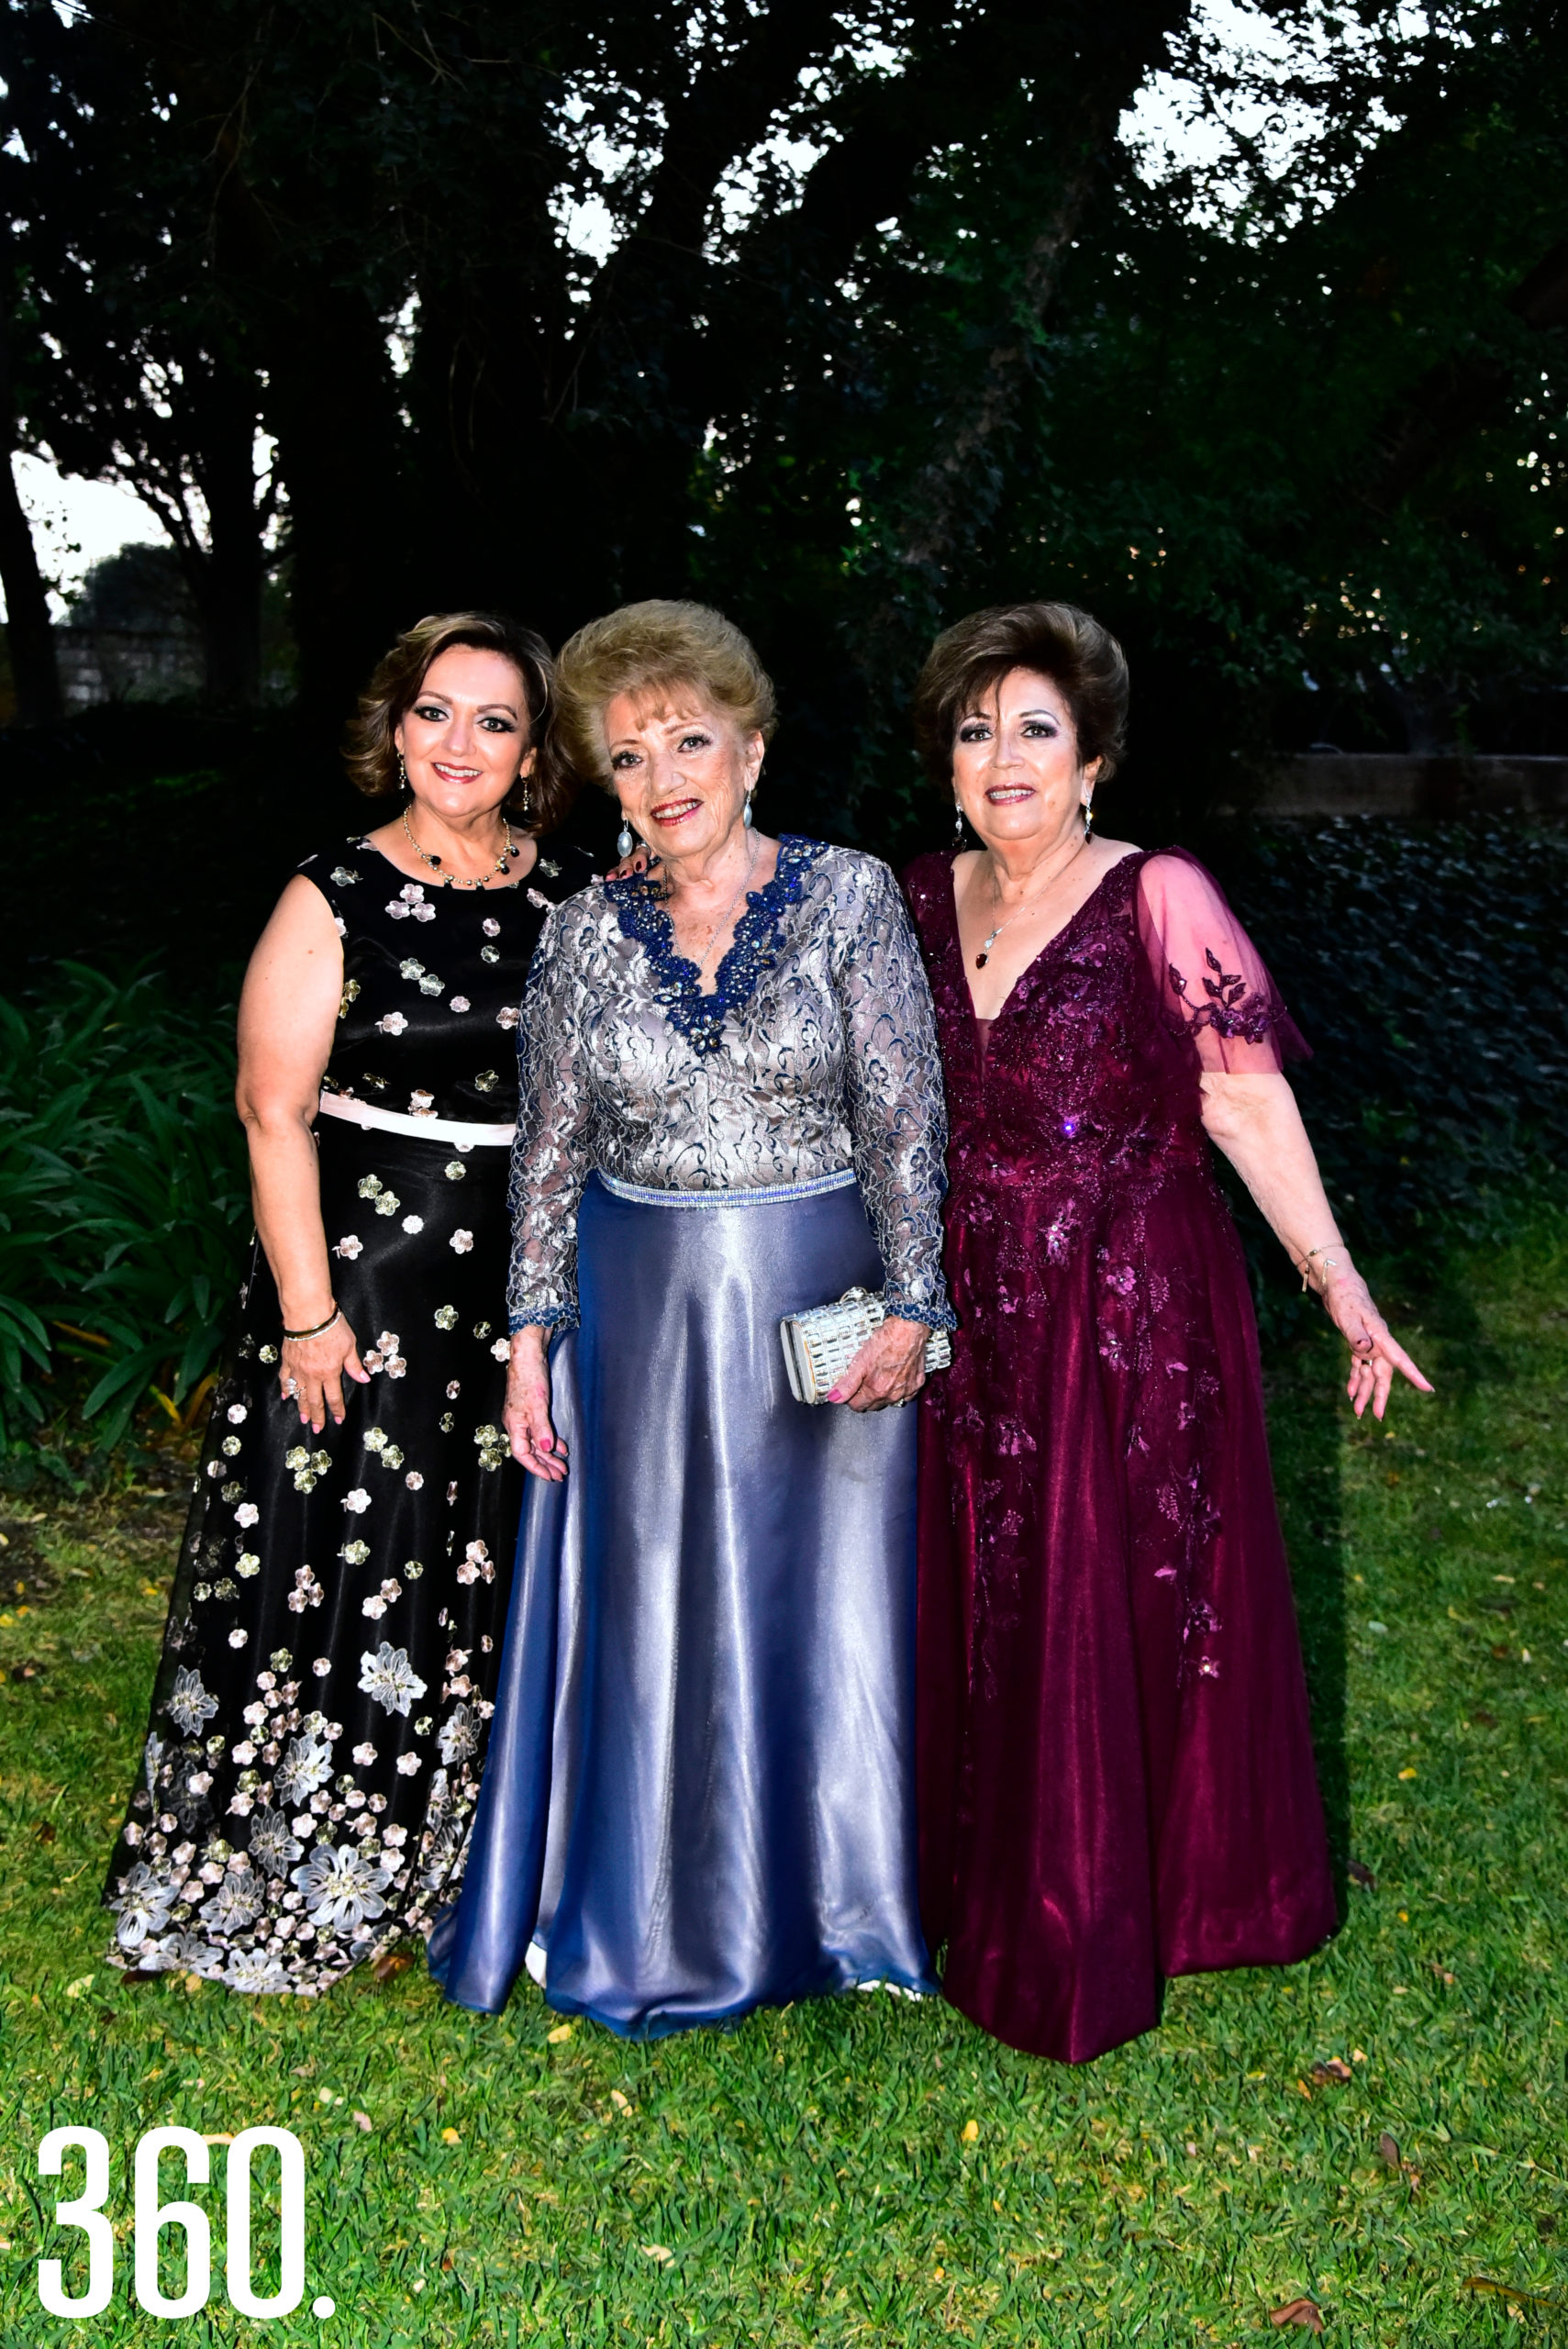 Martha Molina, Guadalupe Aguirre y Nelly Molina.